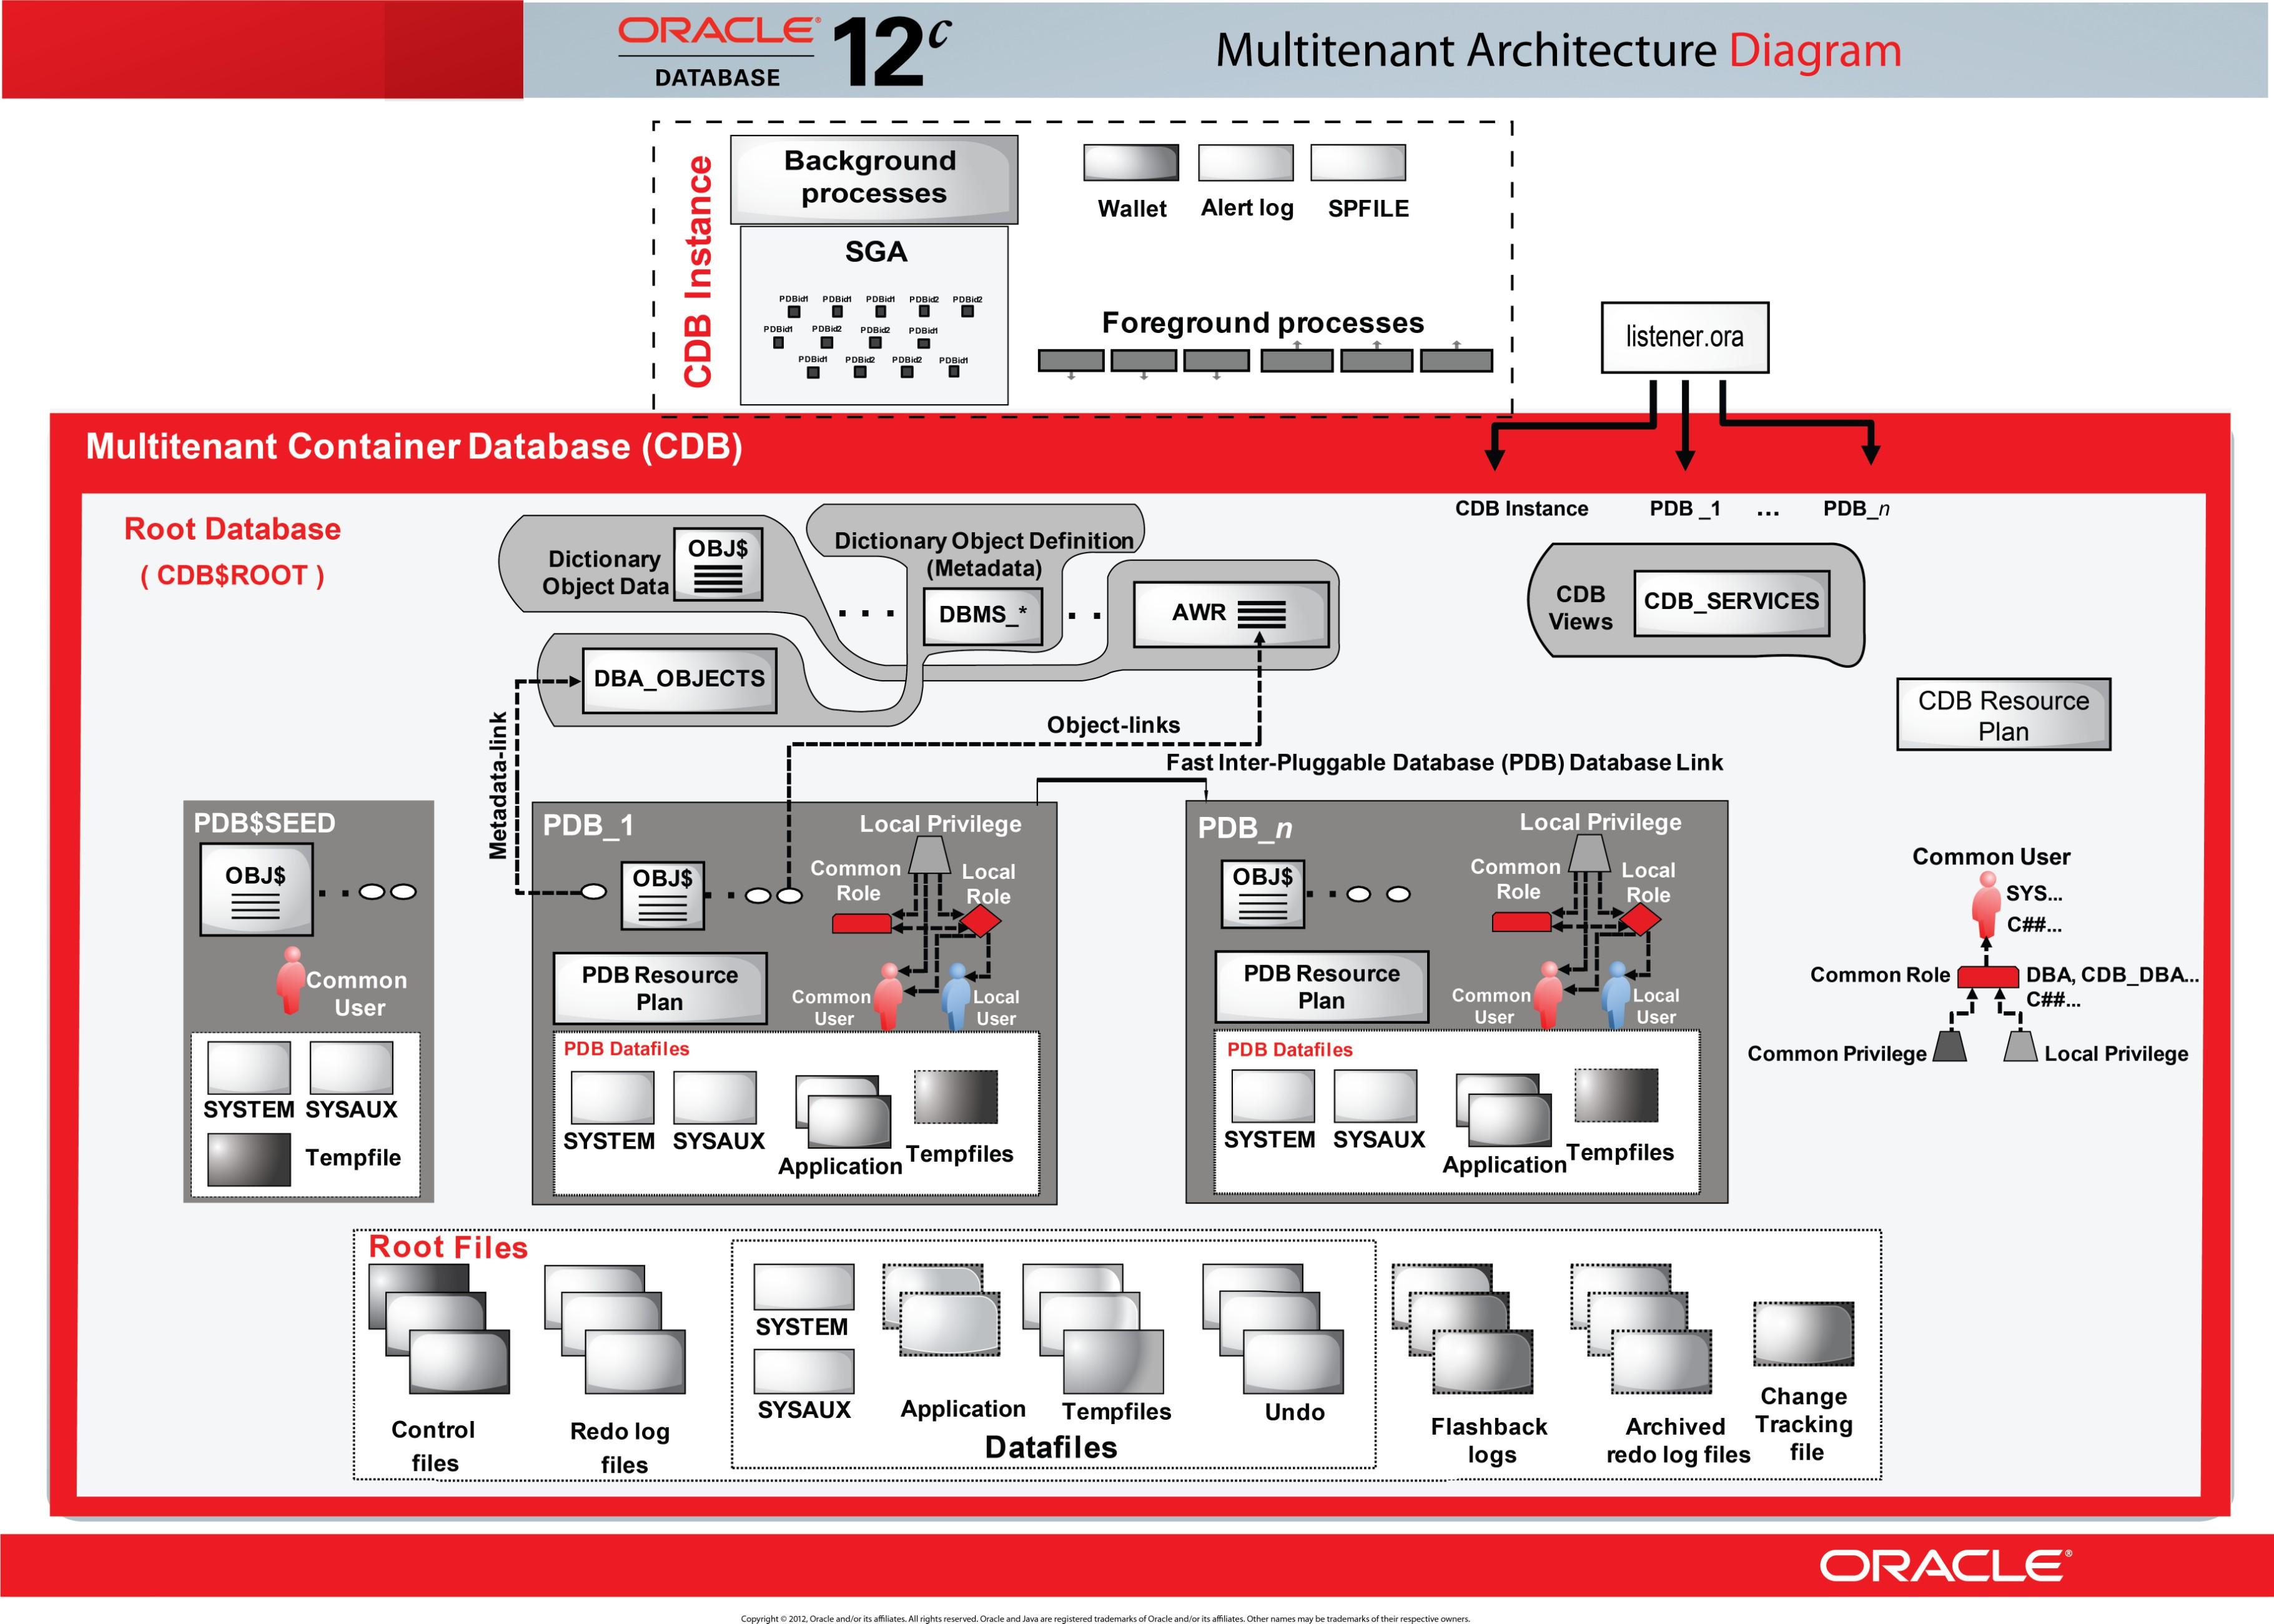 Oracle 12c Multitenant Architecture